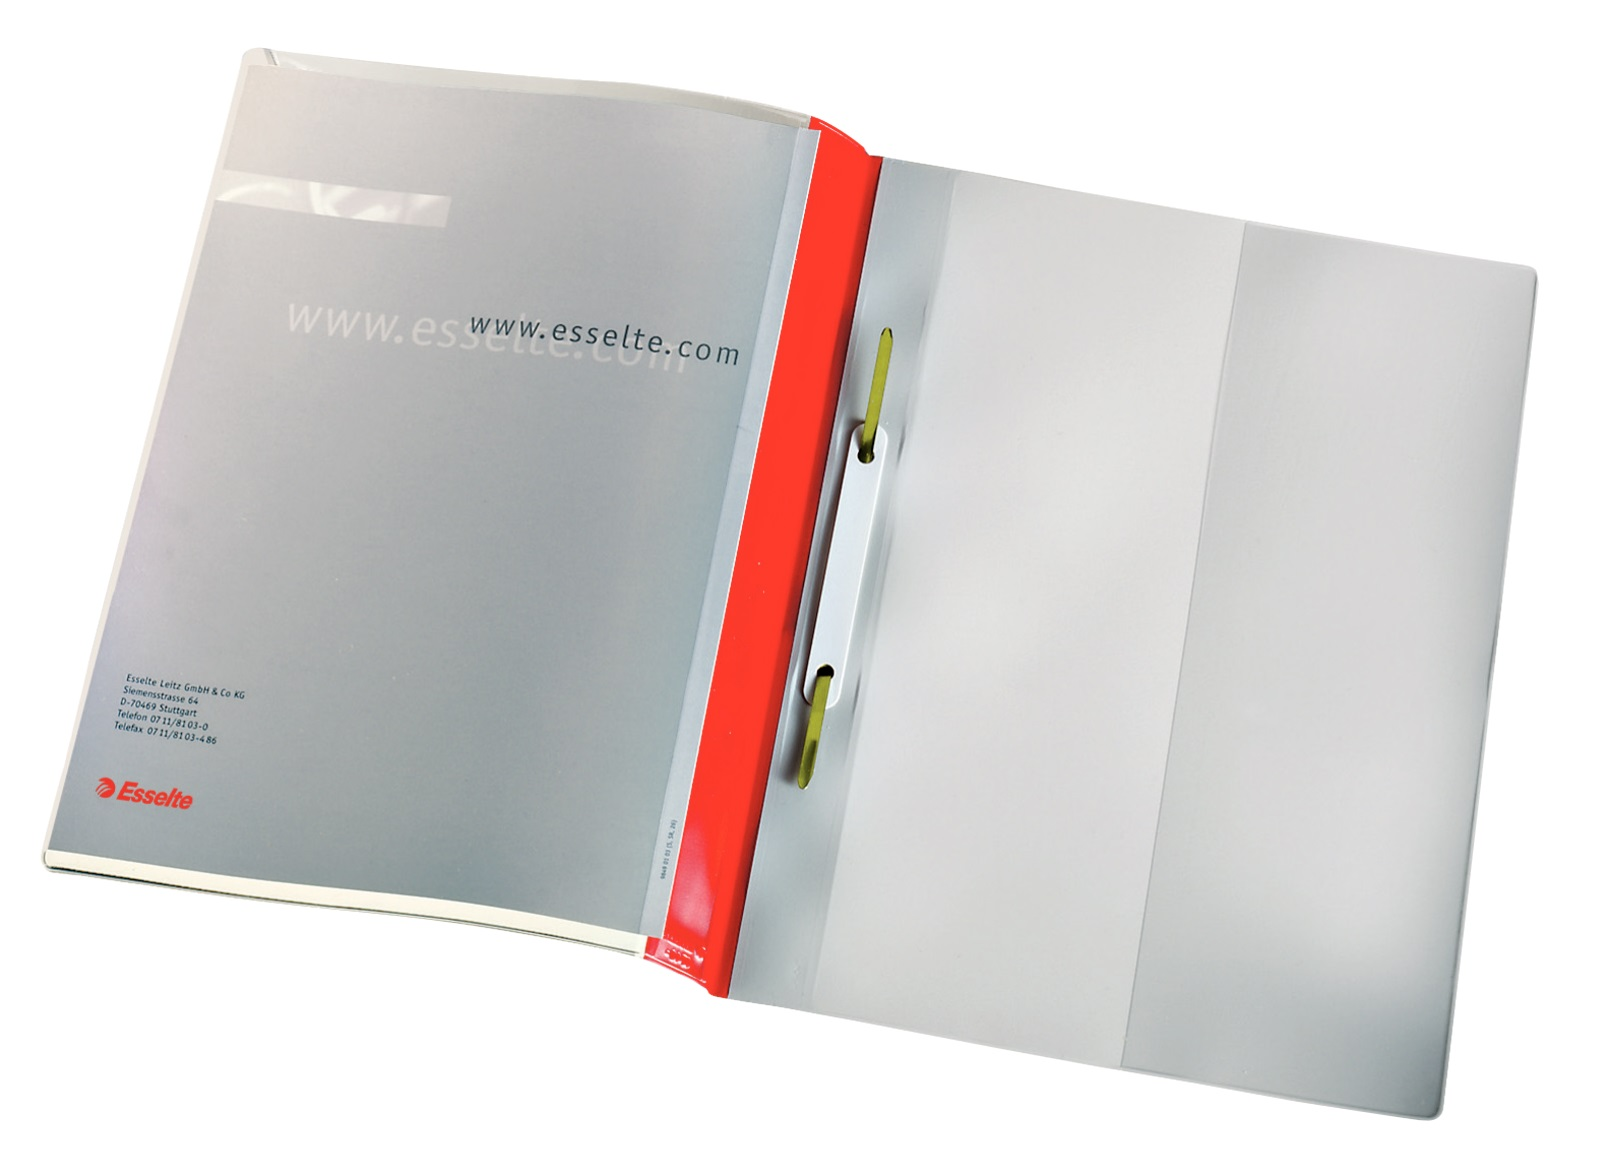 Descriere Dosar din plastic, cu sina, buzunar frontal, rosu, 25 buc/set, ESSELTE Panorama